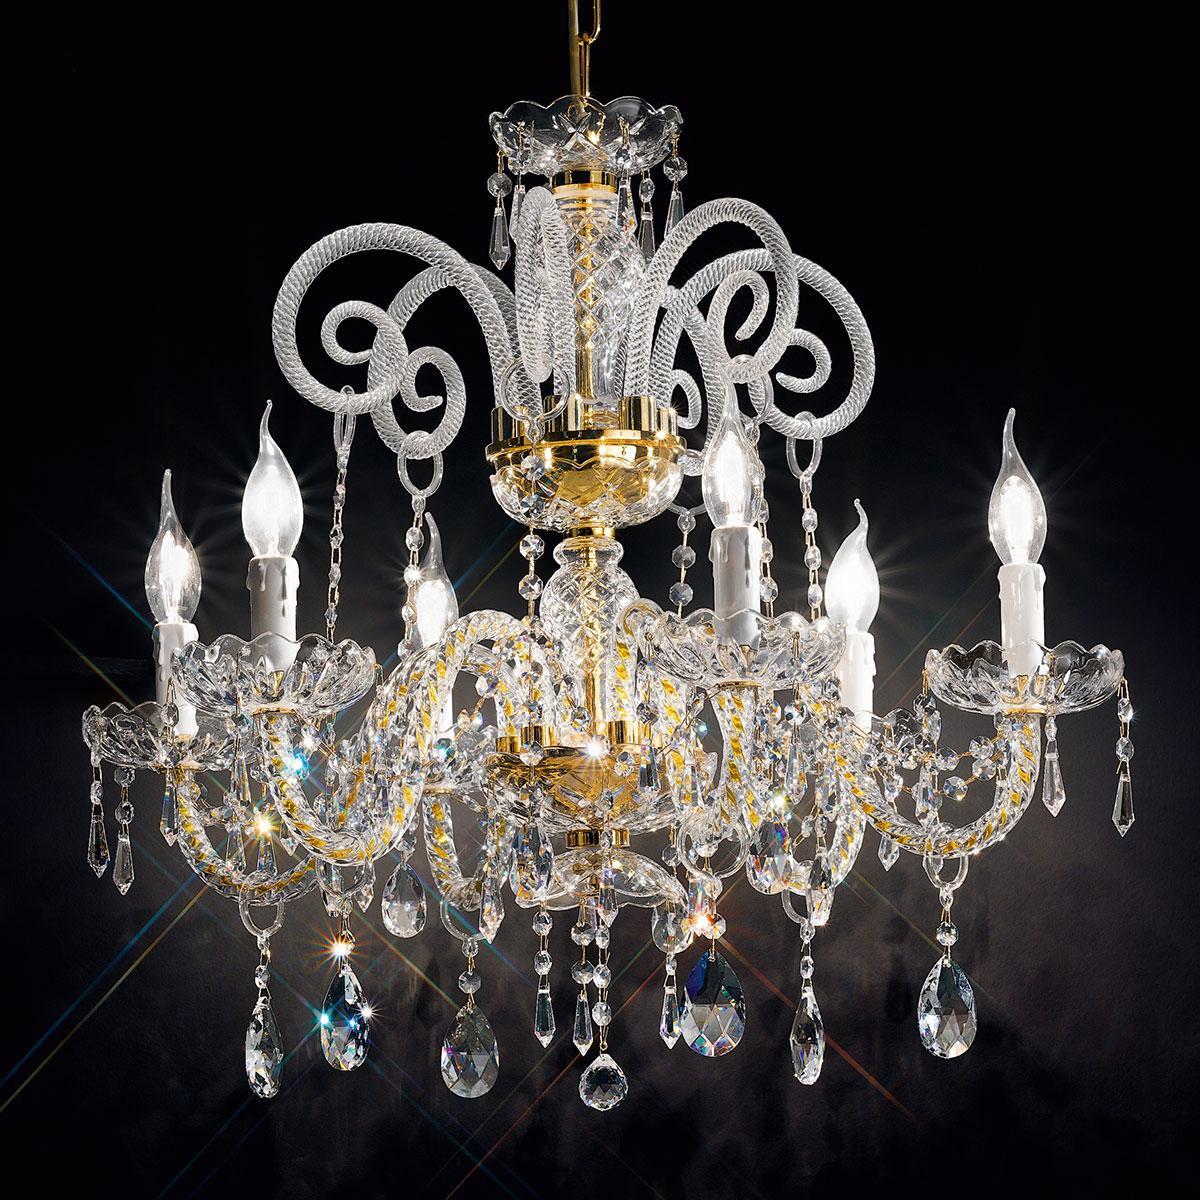 """Signorini"" venetian crystal chandelier - 6 lights - transparent with Asfour venetian crystal"